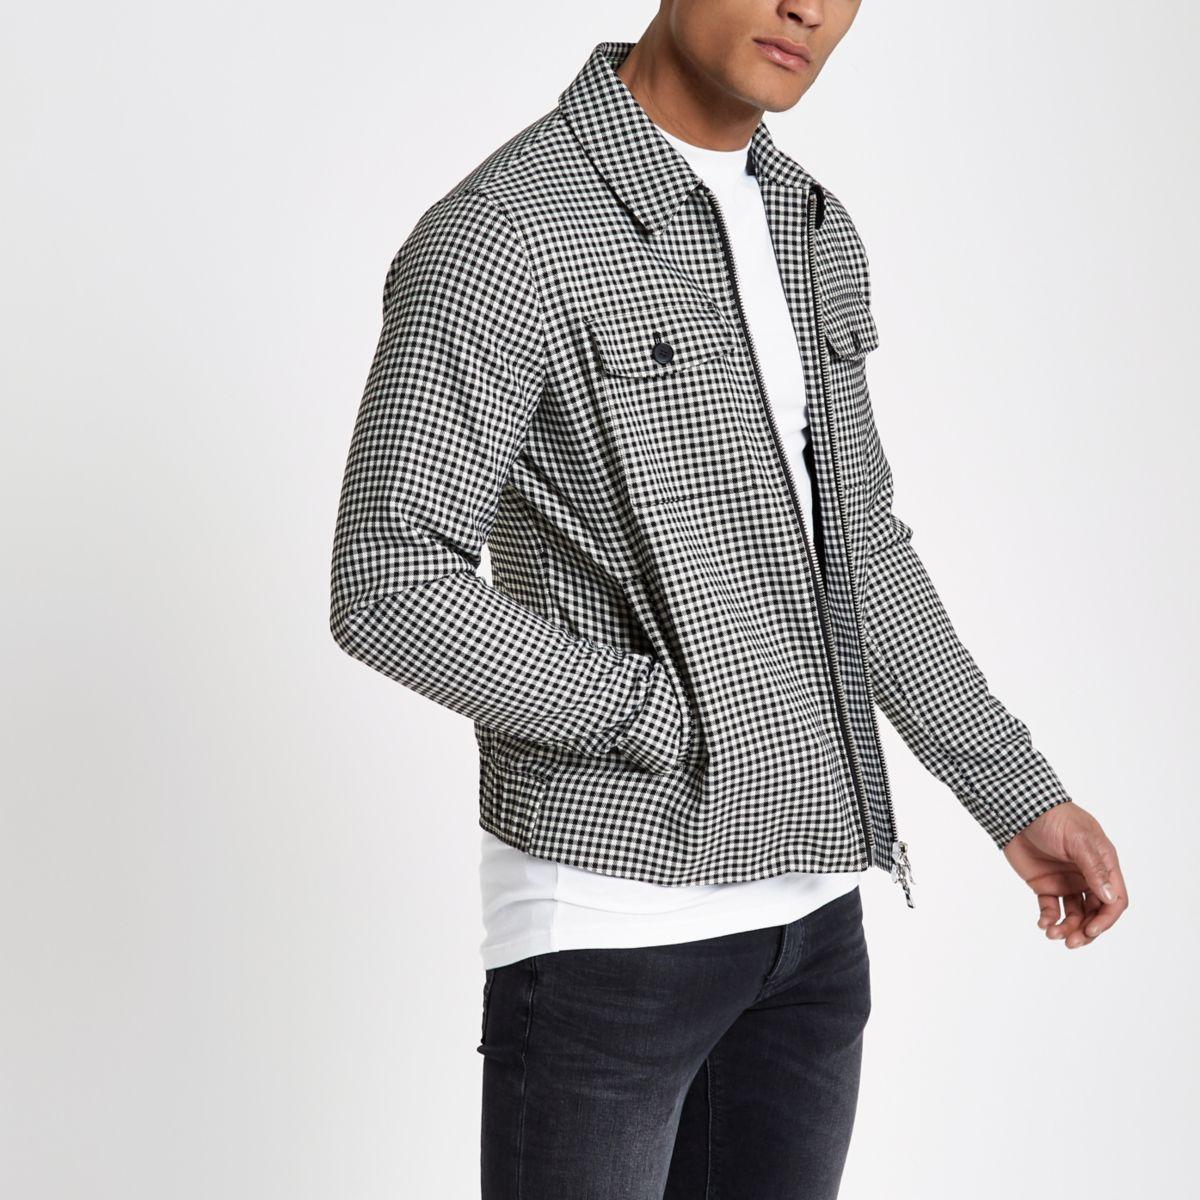 Black gingham print jacket